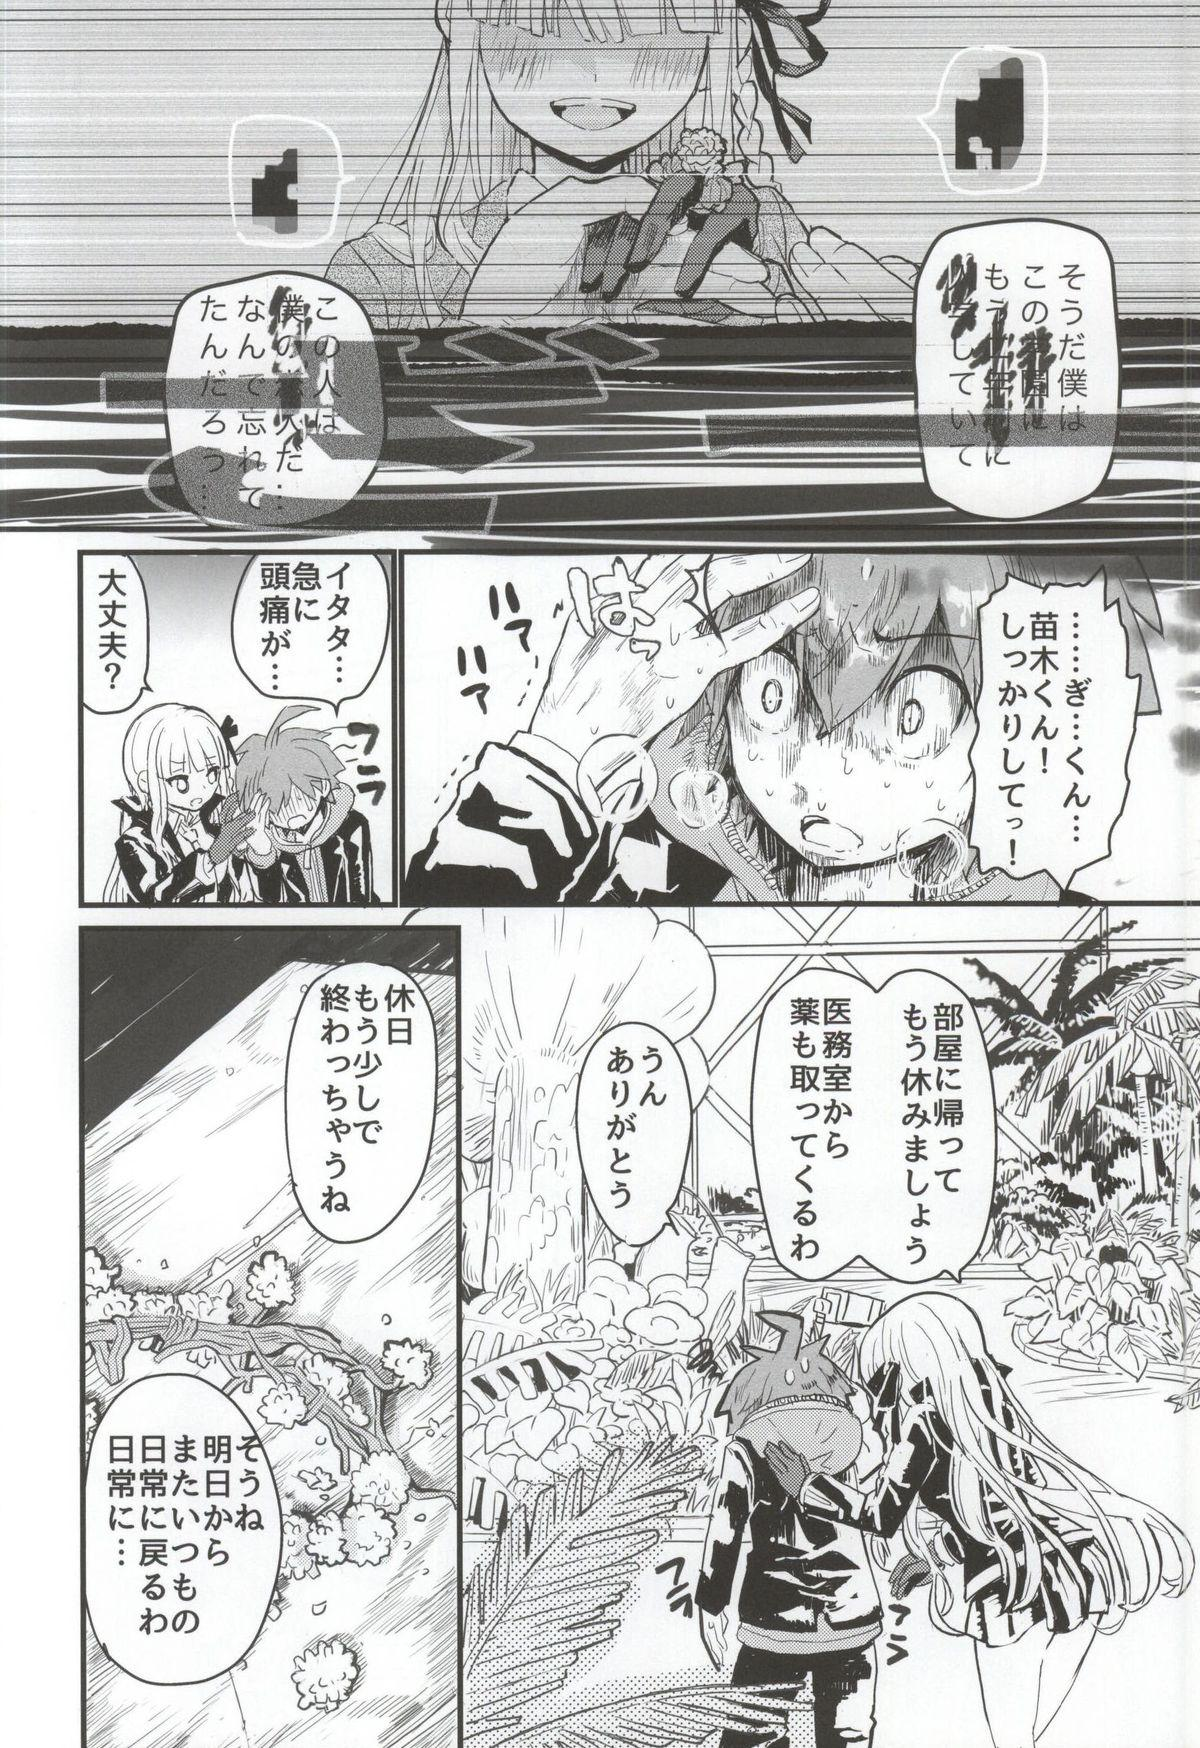 Kirigiri-san to Issho ni School Mode 22